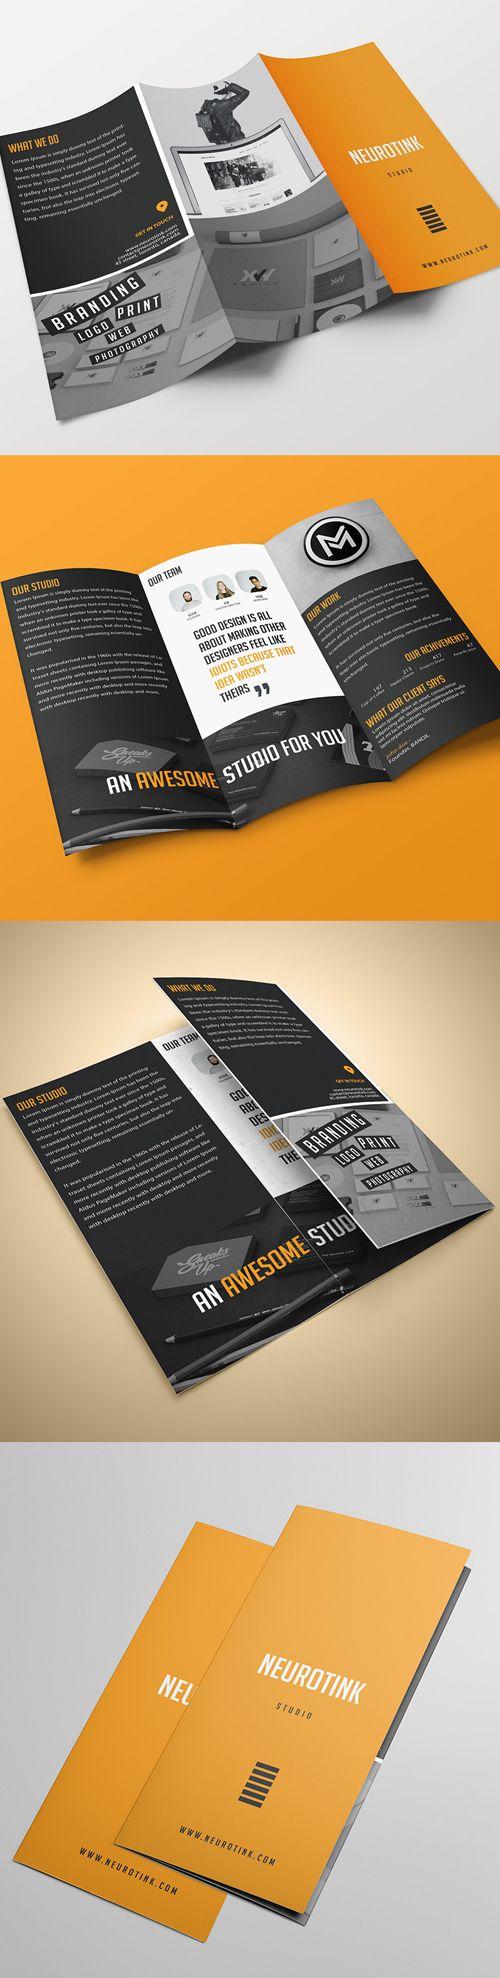 Agency Tri-fold Brochure Template